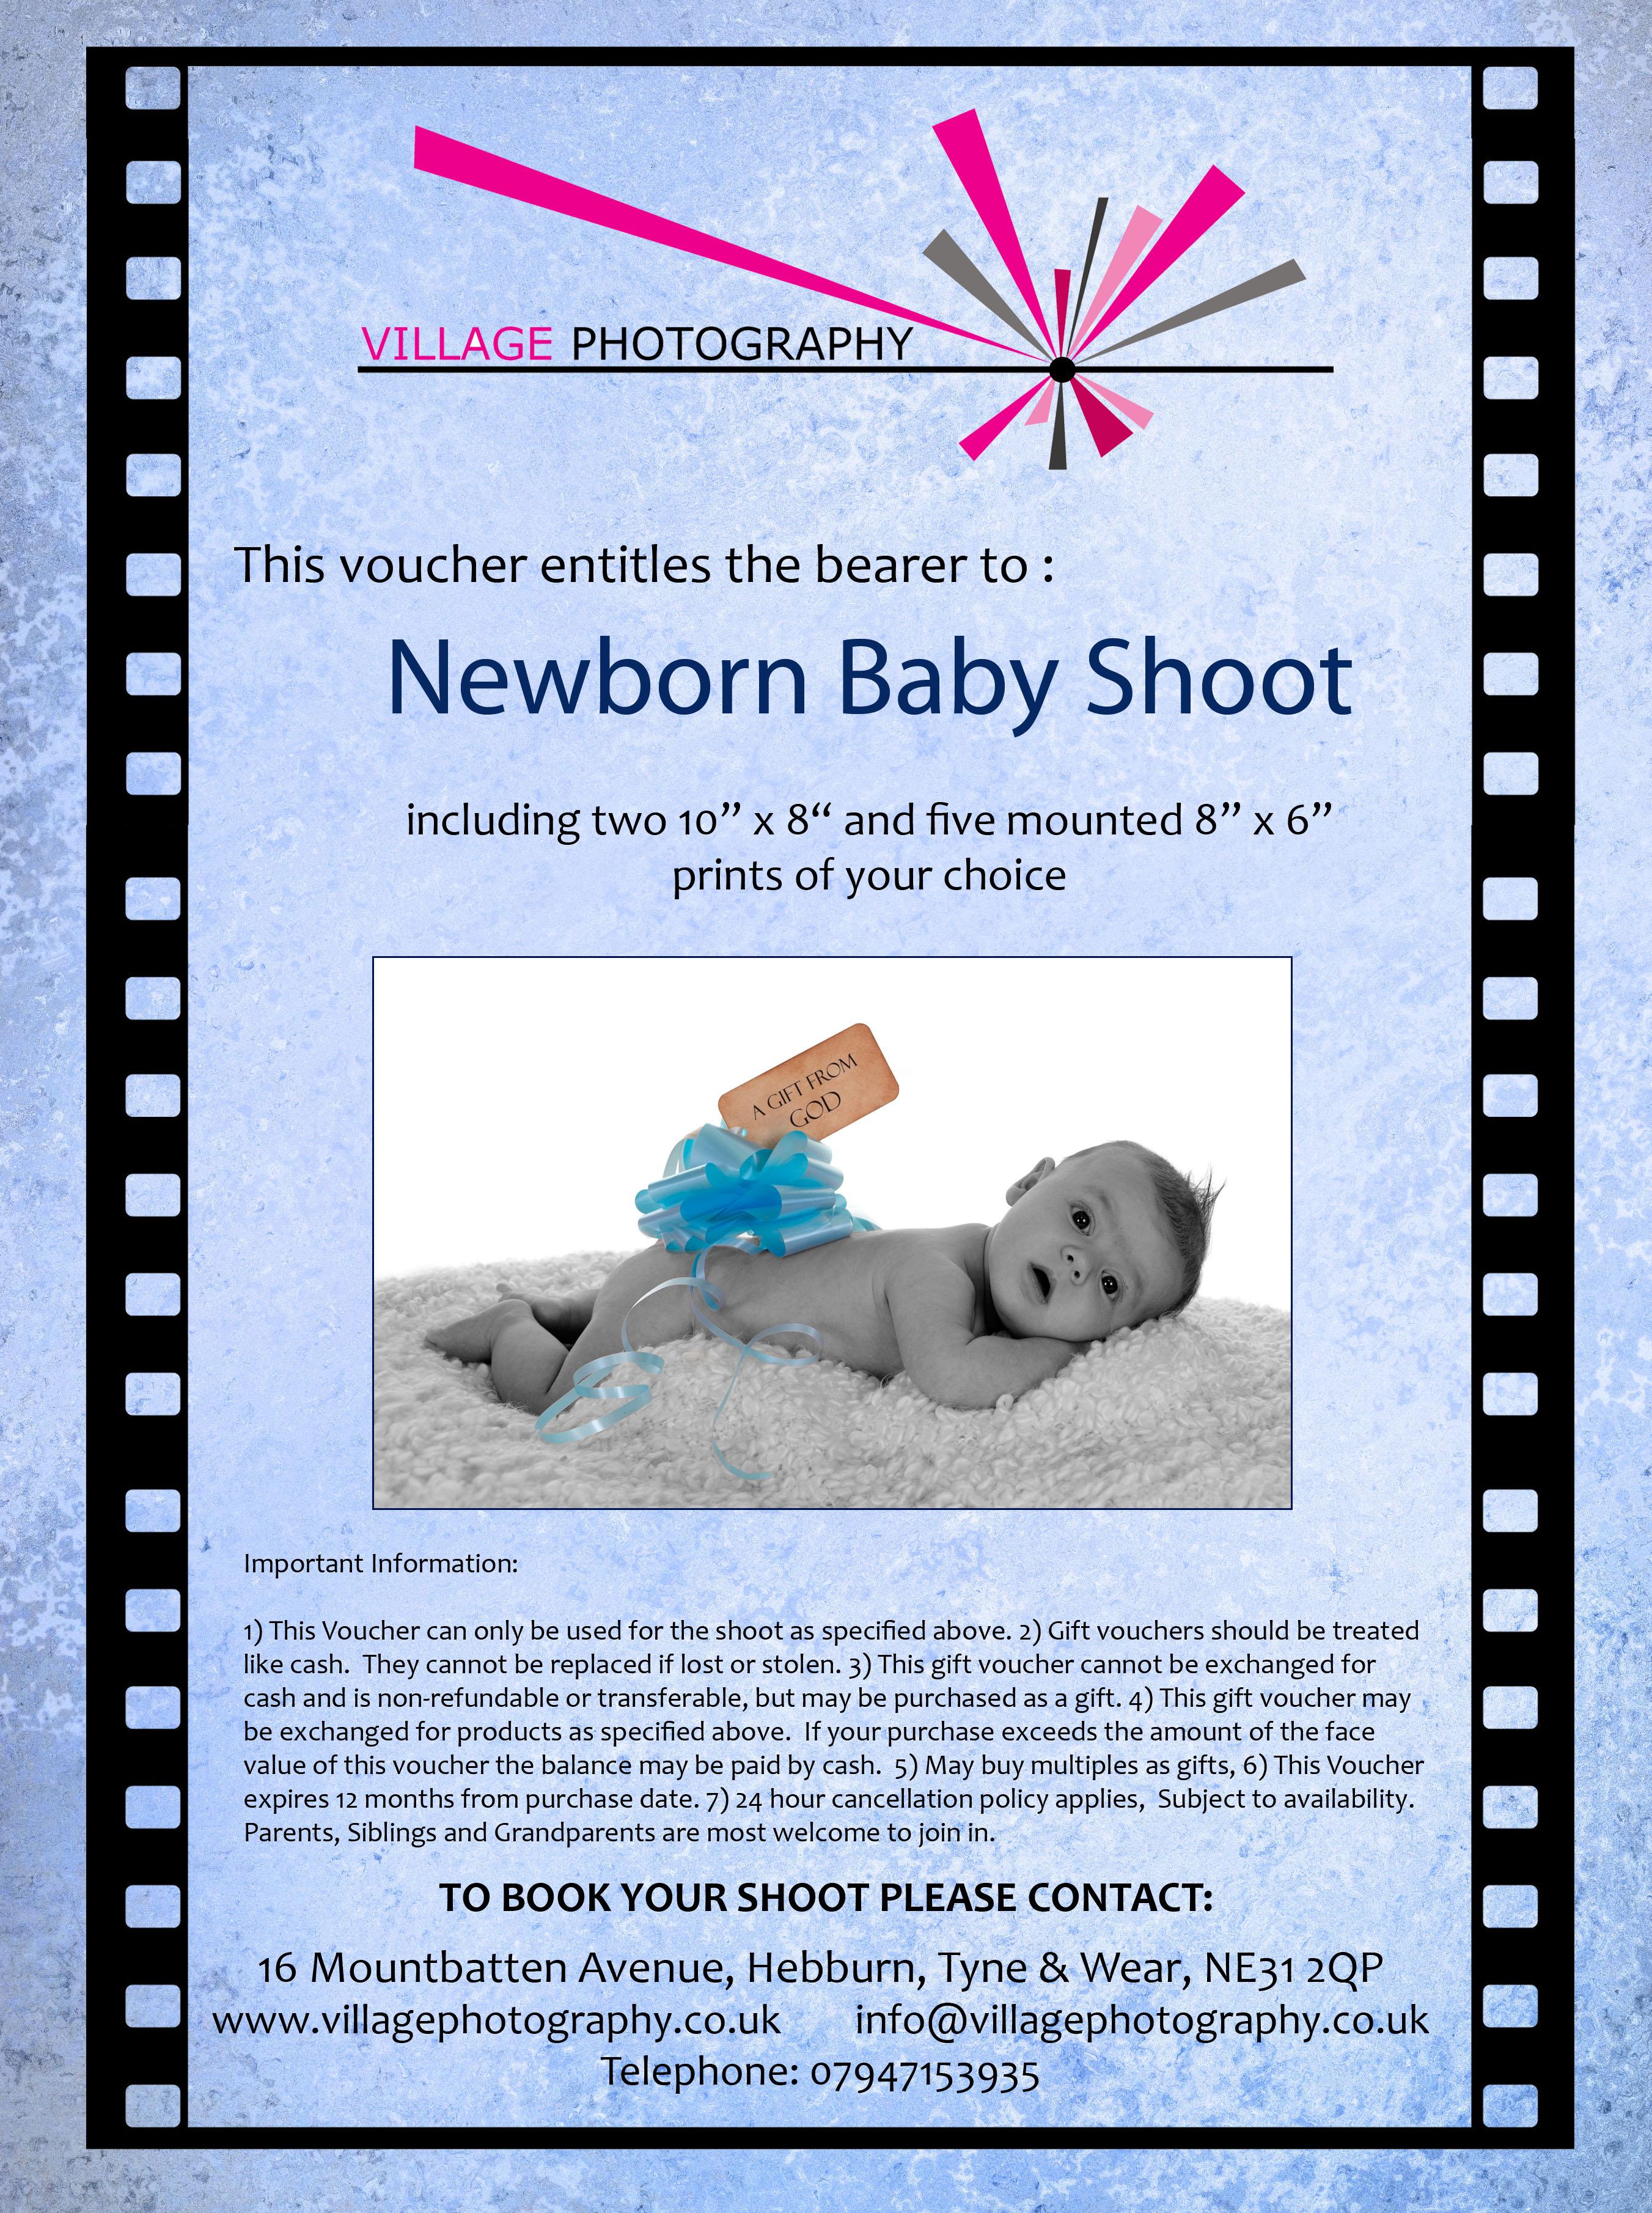 Baby Boy Gifts Newcastle : New born baby shoot boy village photography